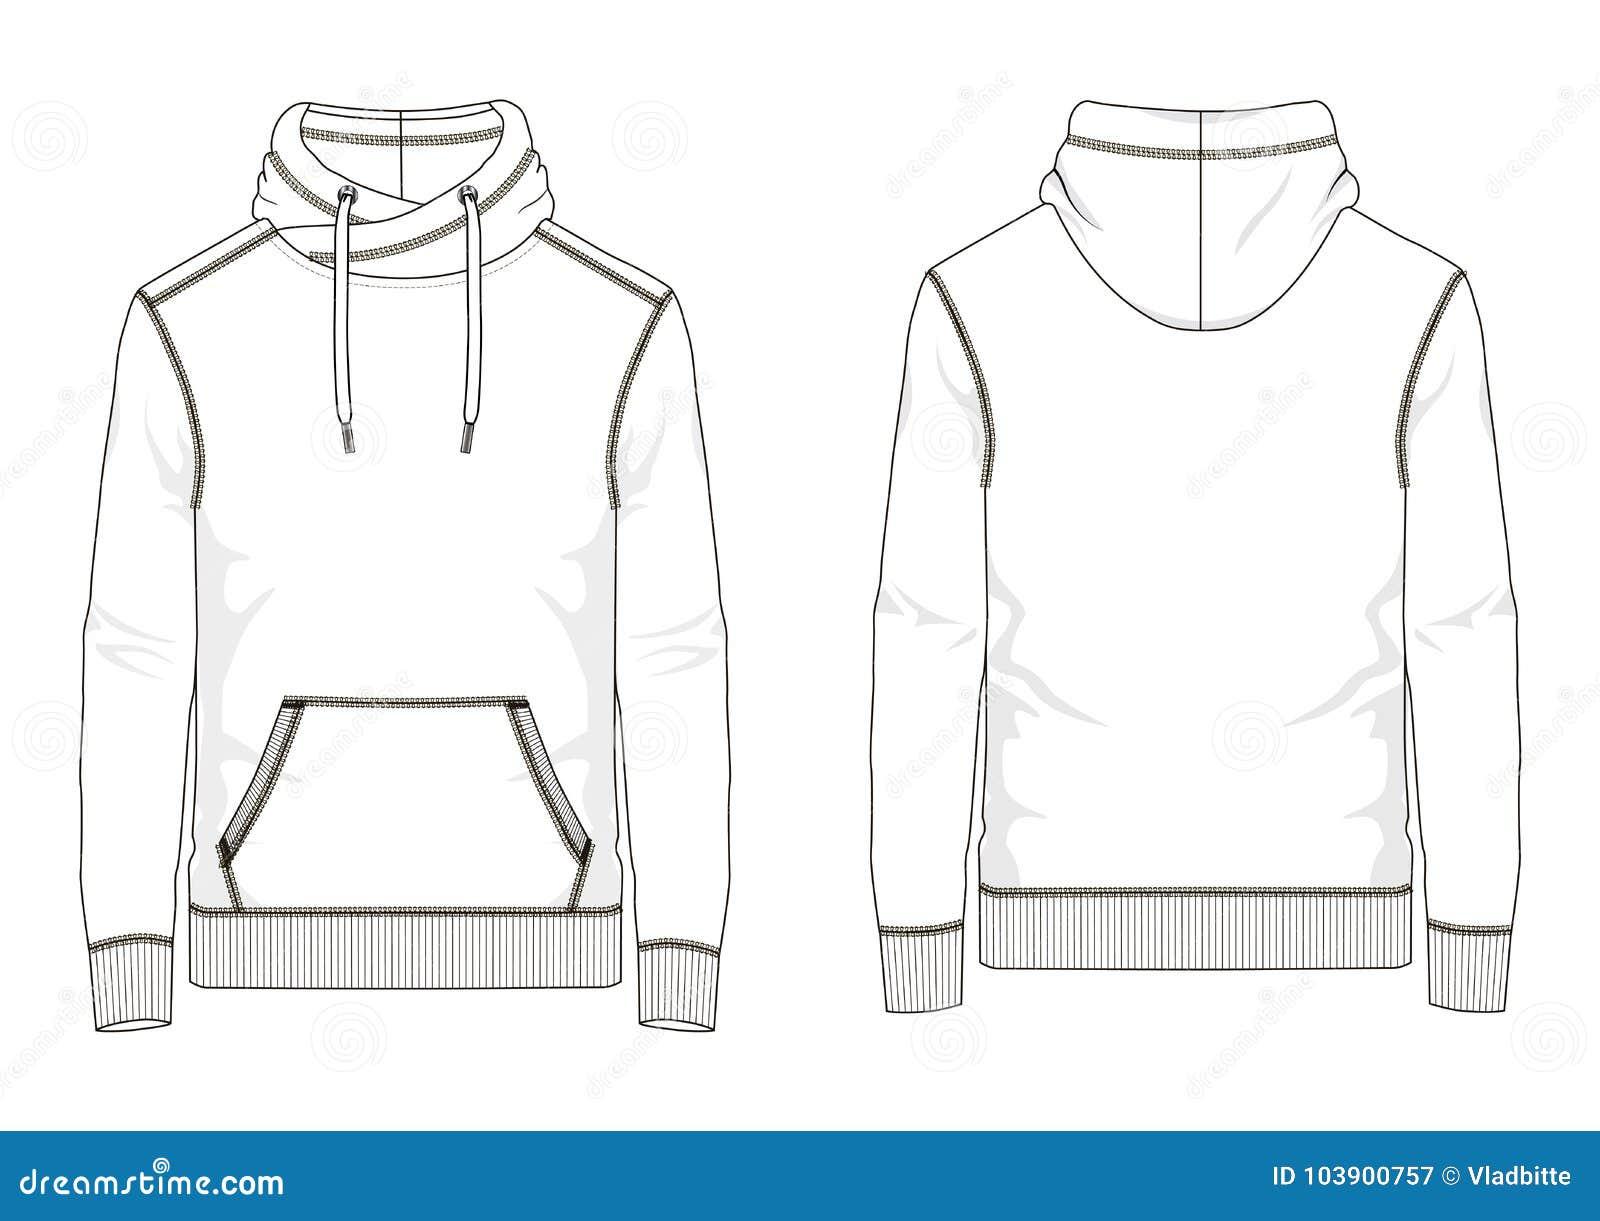 Technical Sketch Of Man Sweatshirt In Vector Stock Vector - Illustration Of Pocket White 103900757